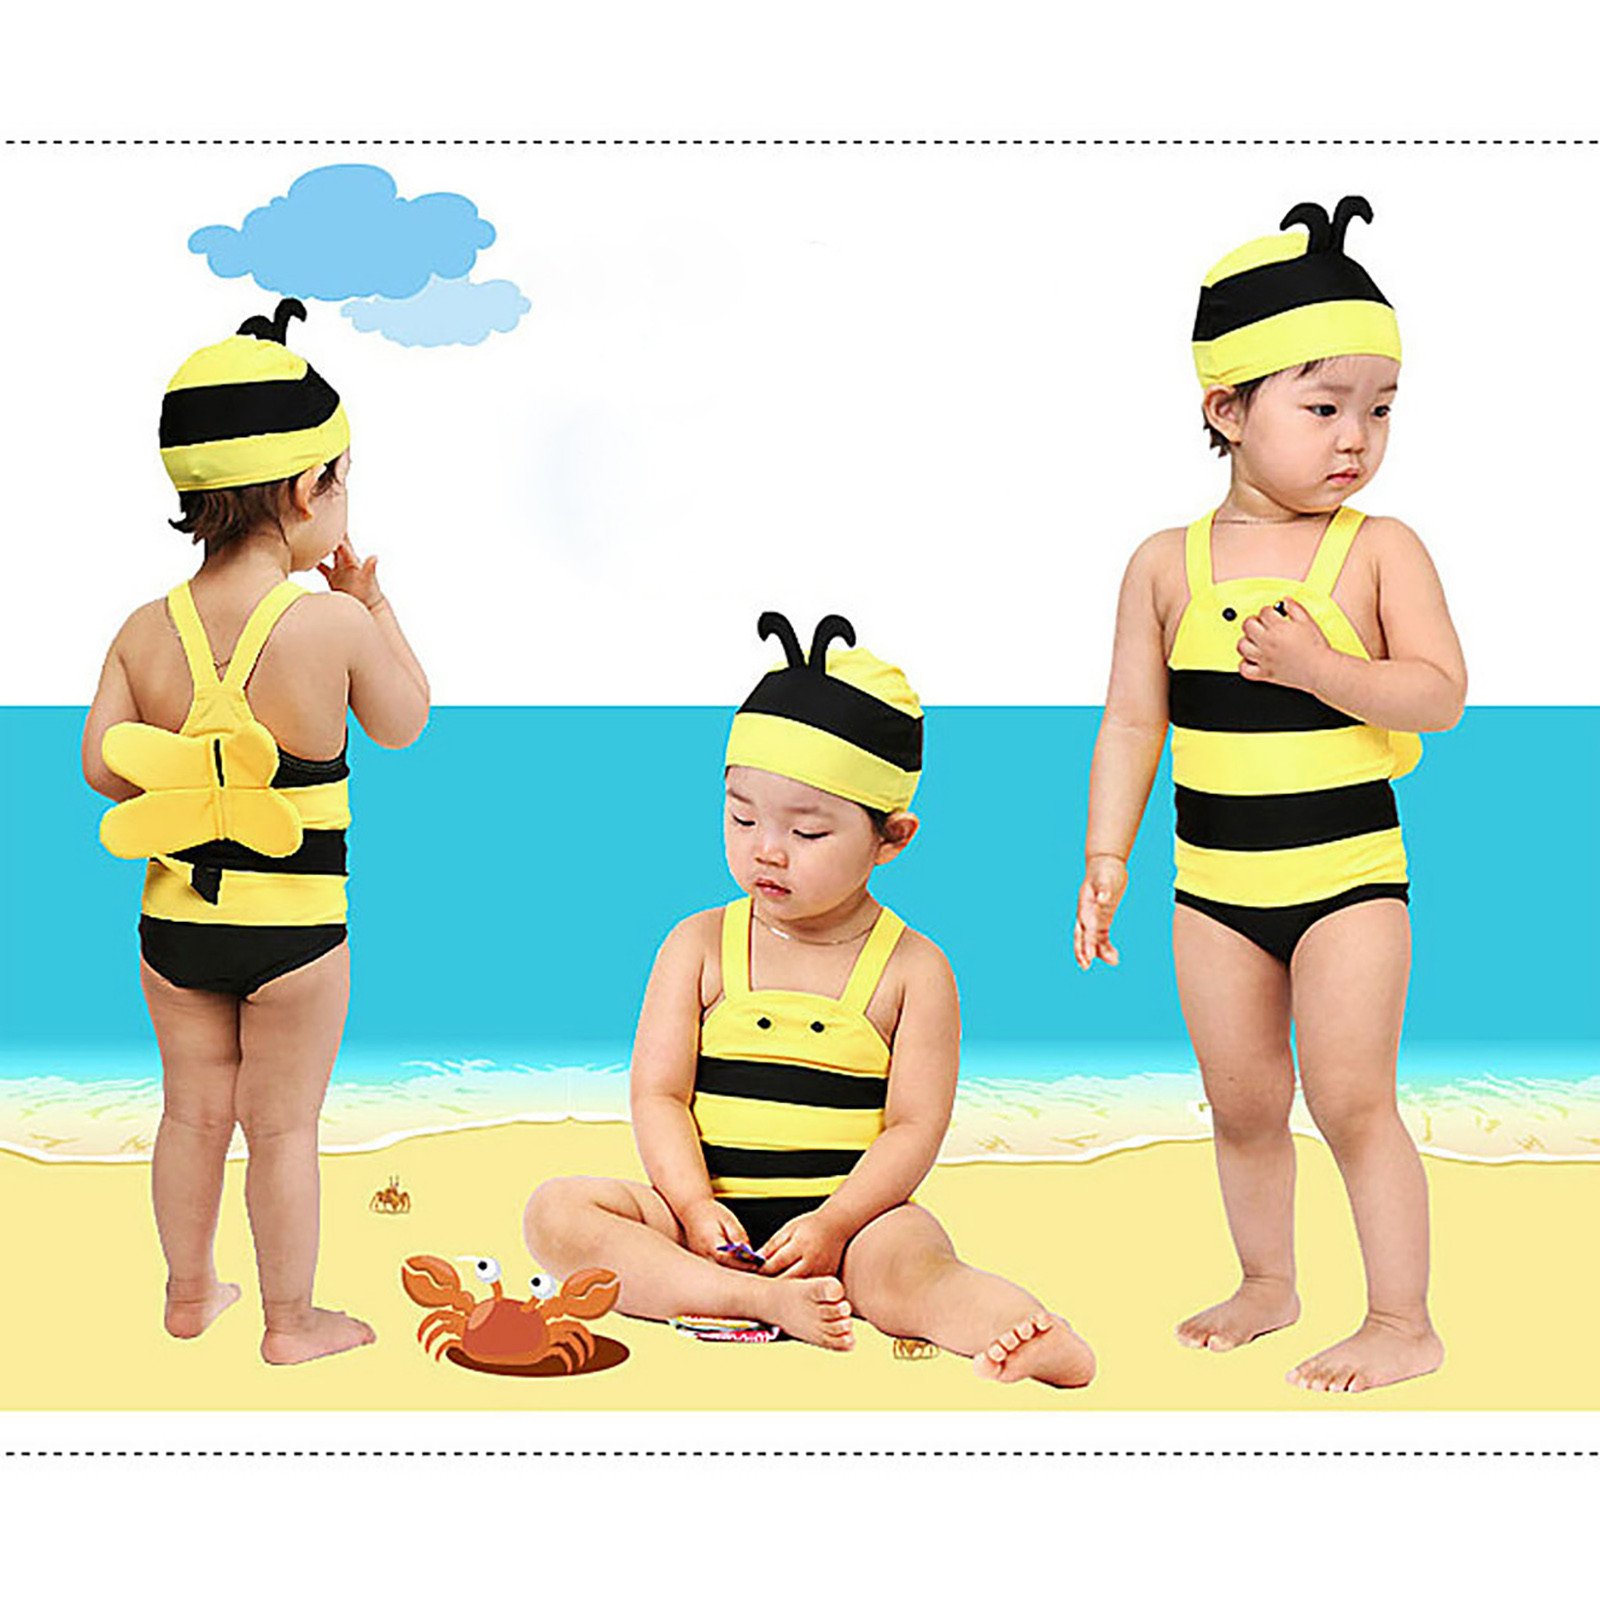 girls swimwear Toddler kids Baby Boy Girl Sleeveless Cartoon Beach  Swimwear Straps Set Outfits купальник детский детский купалн